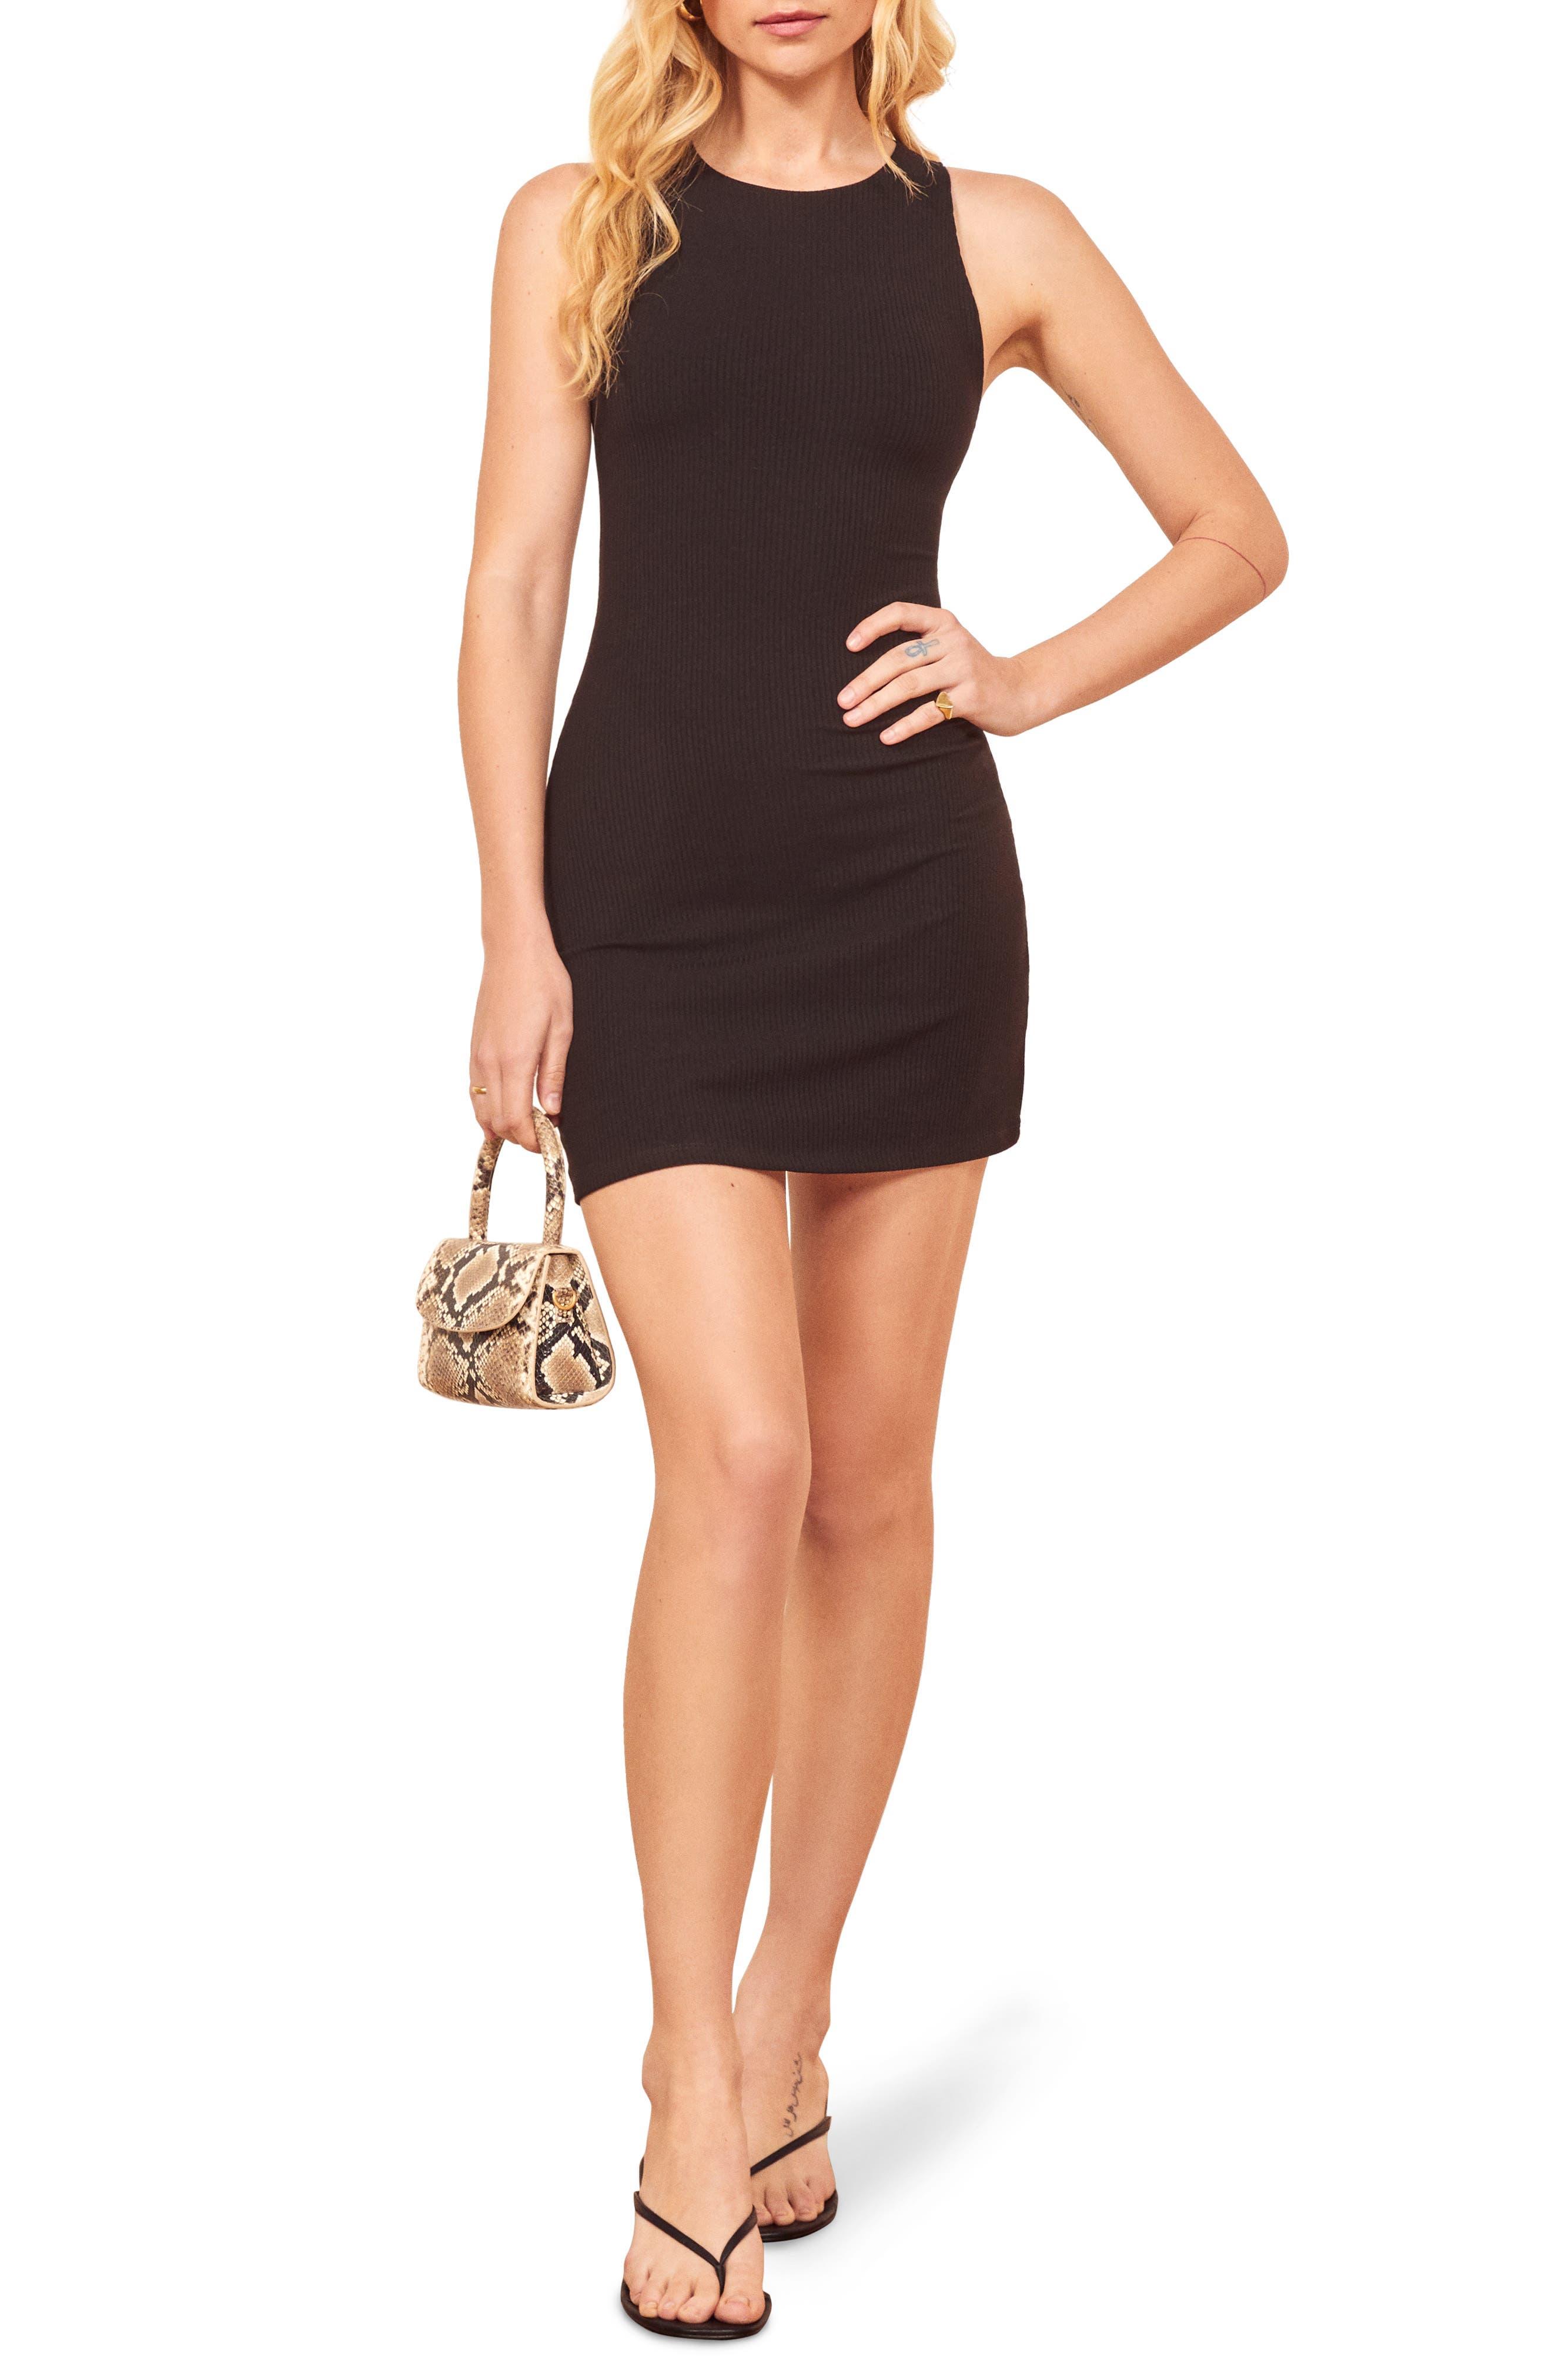 Reformation Kris Sleeveless Body-Con Dress, Black